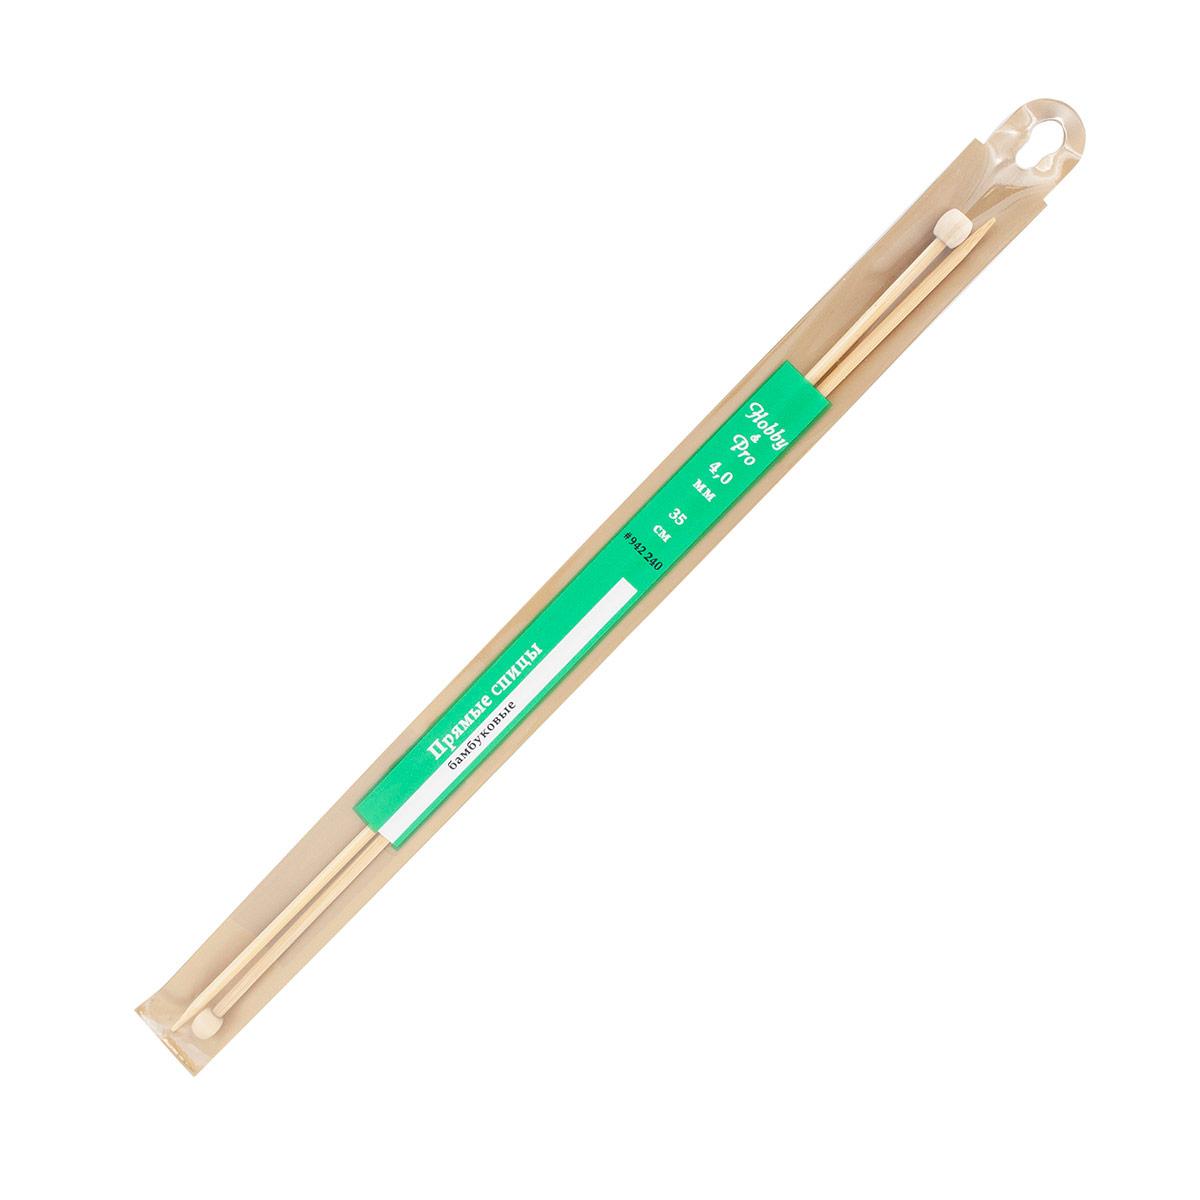 Спицы прямые бамбук 942240, 35 см, 4,0 мм, Hobby&Pro